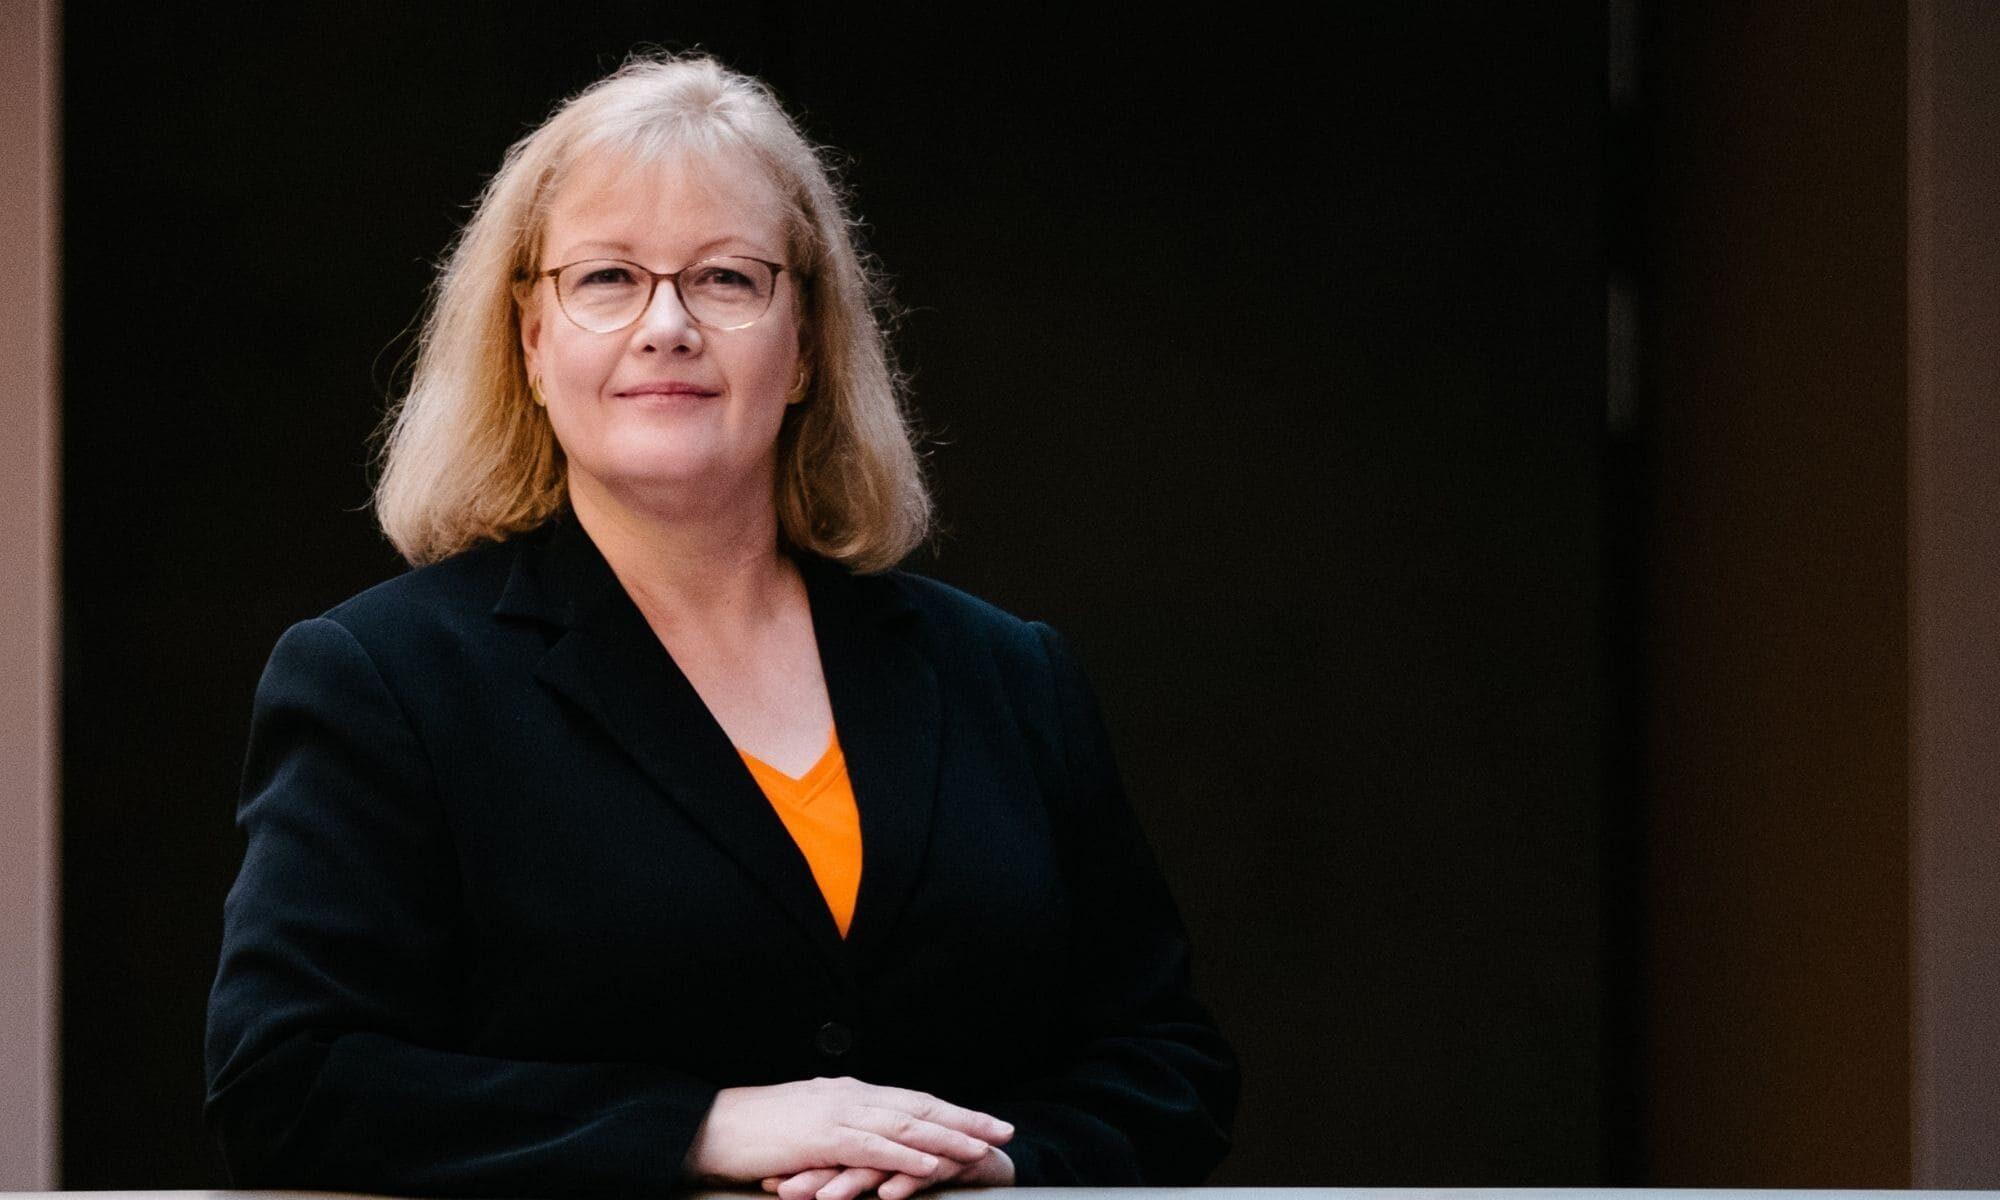 Friederike Galland